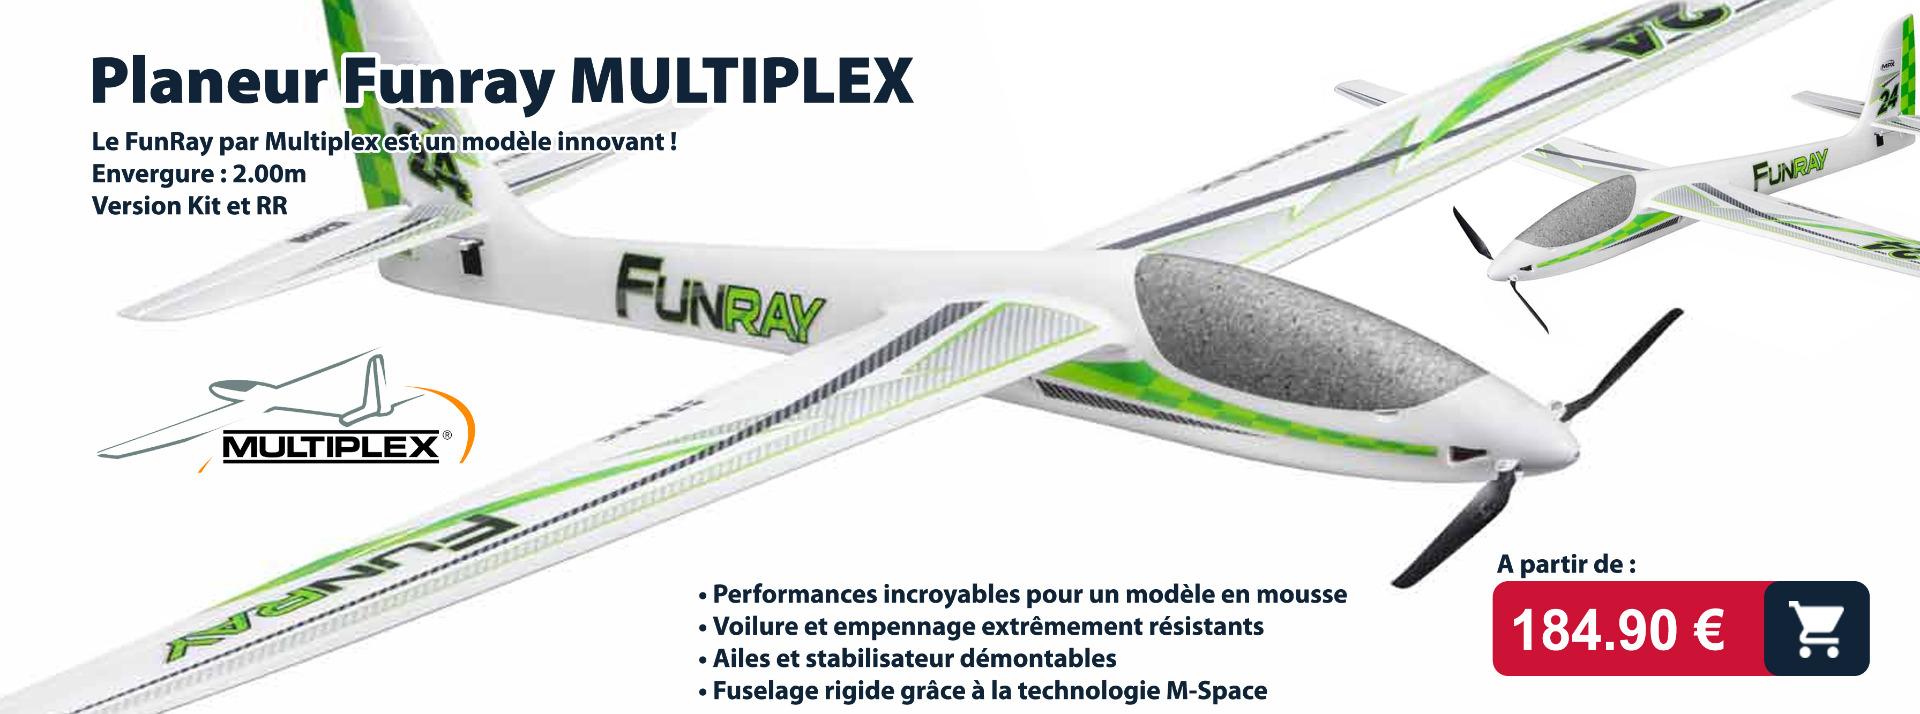 planeur funray multiplex